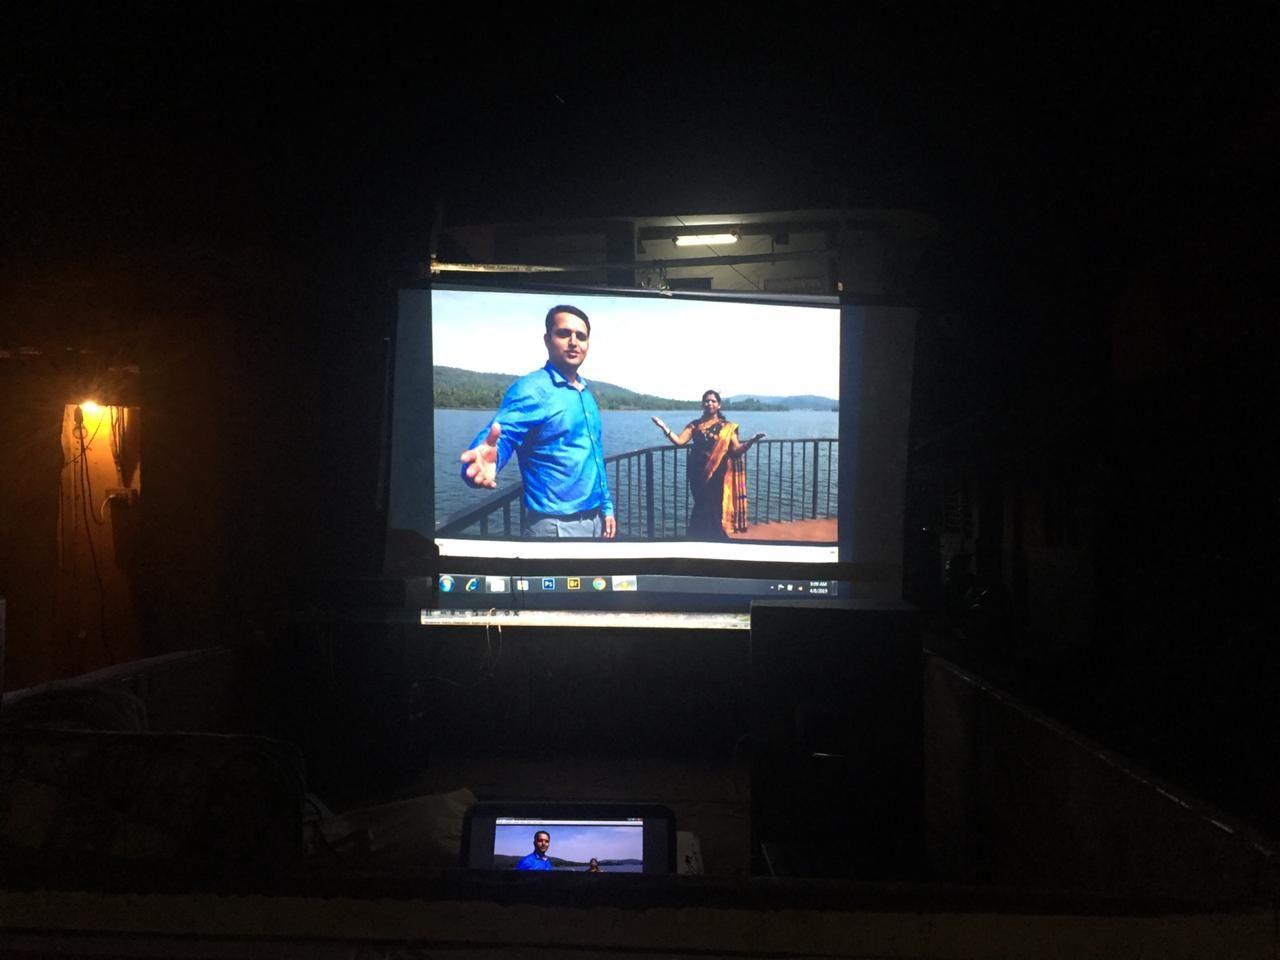 Sveep Video Van At Gaonkarwada (03- Bicholim A.C.)